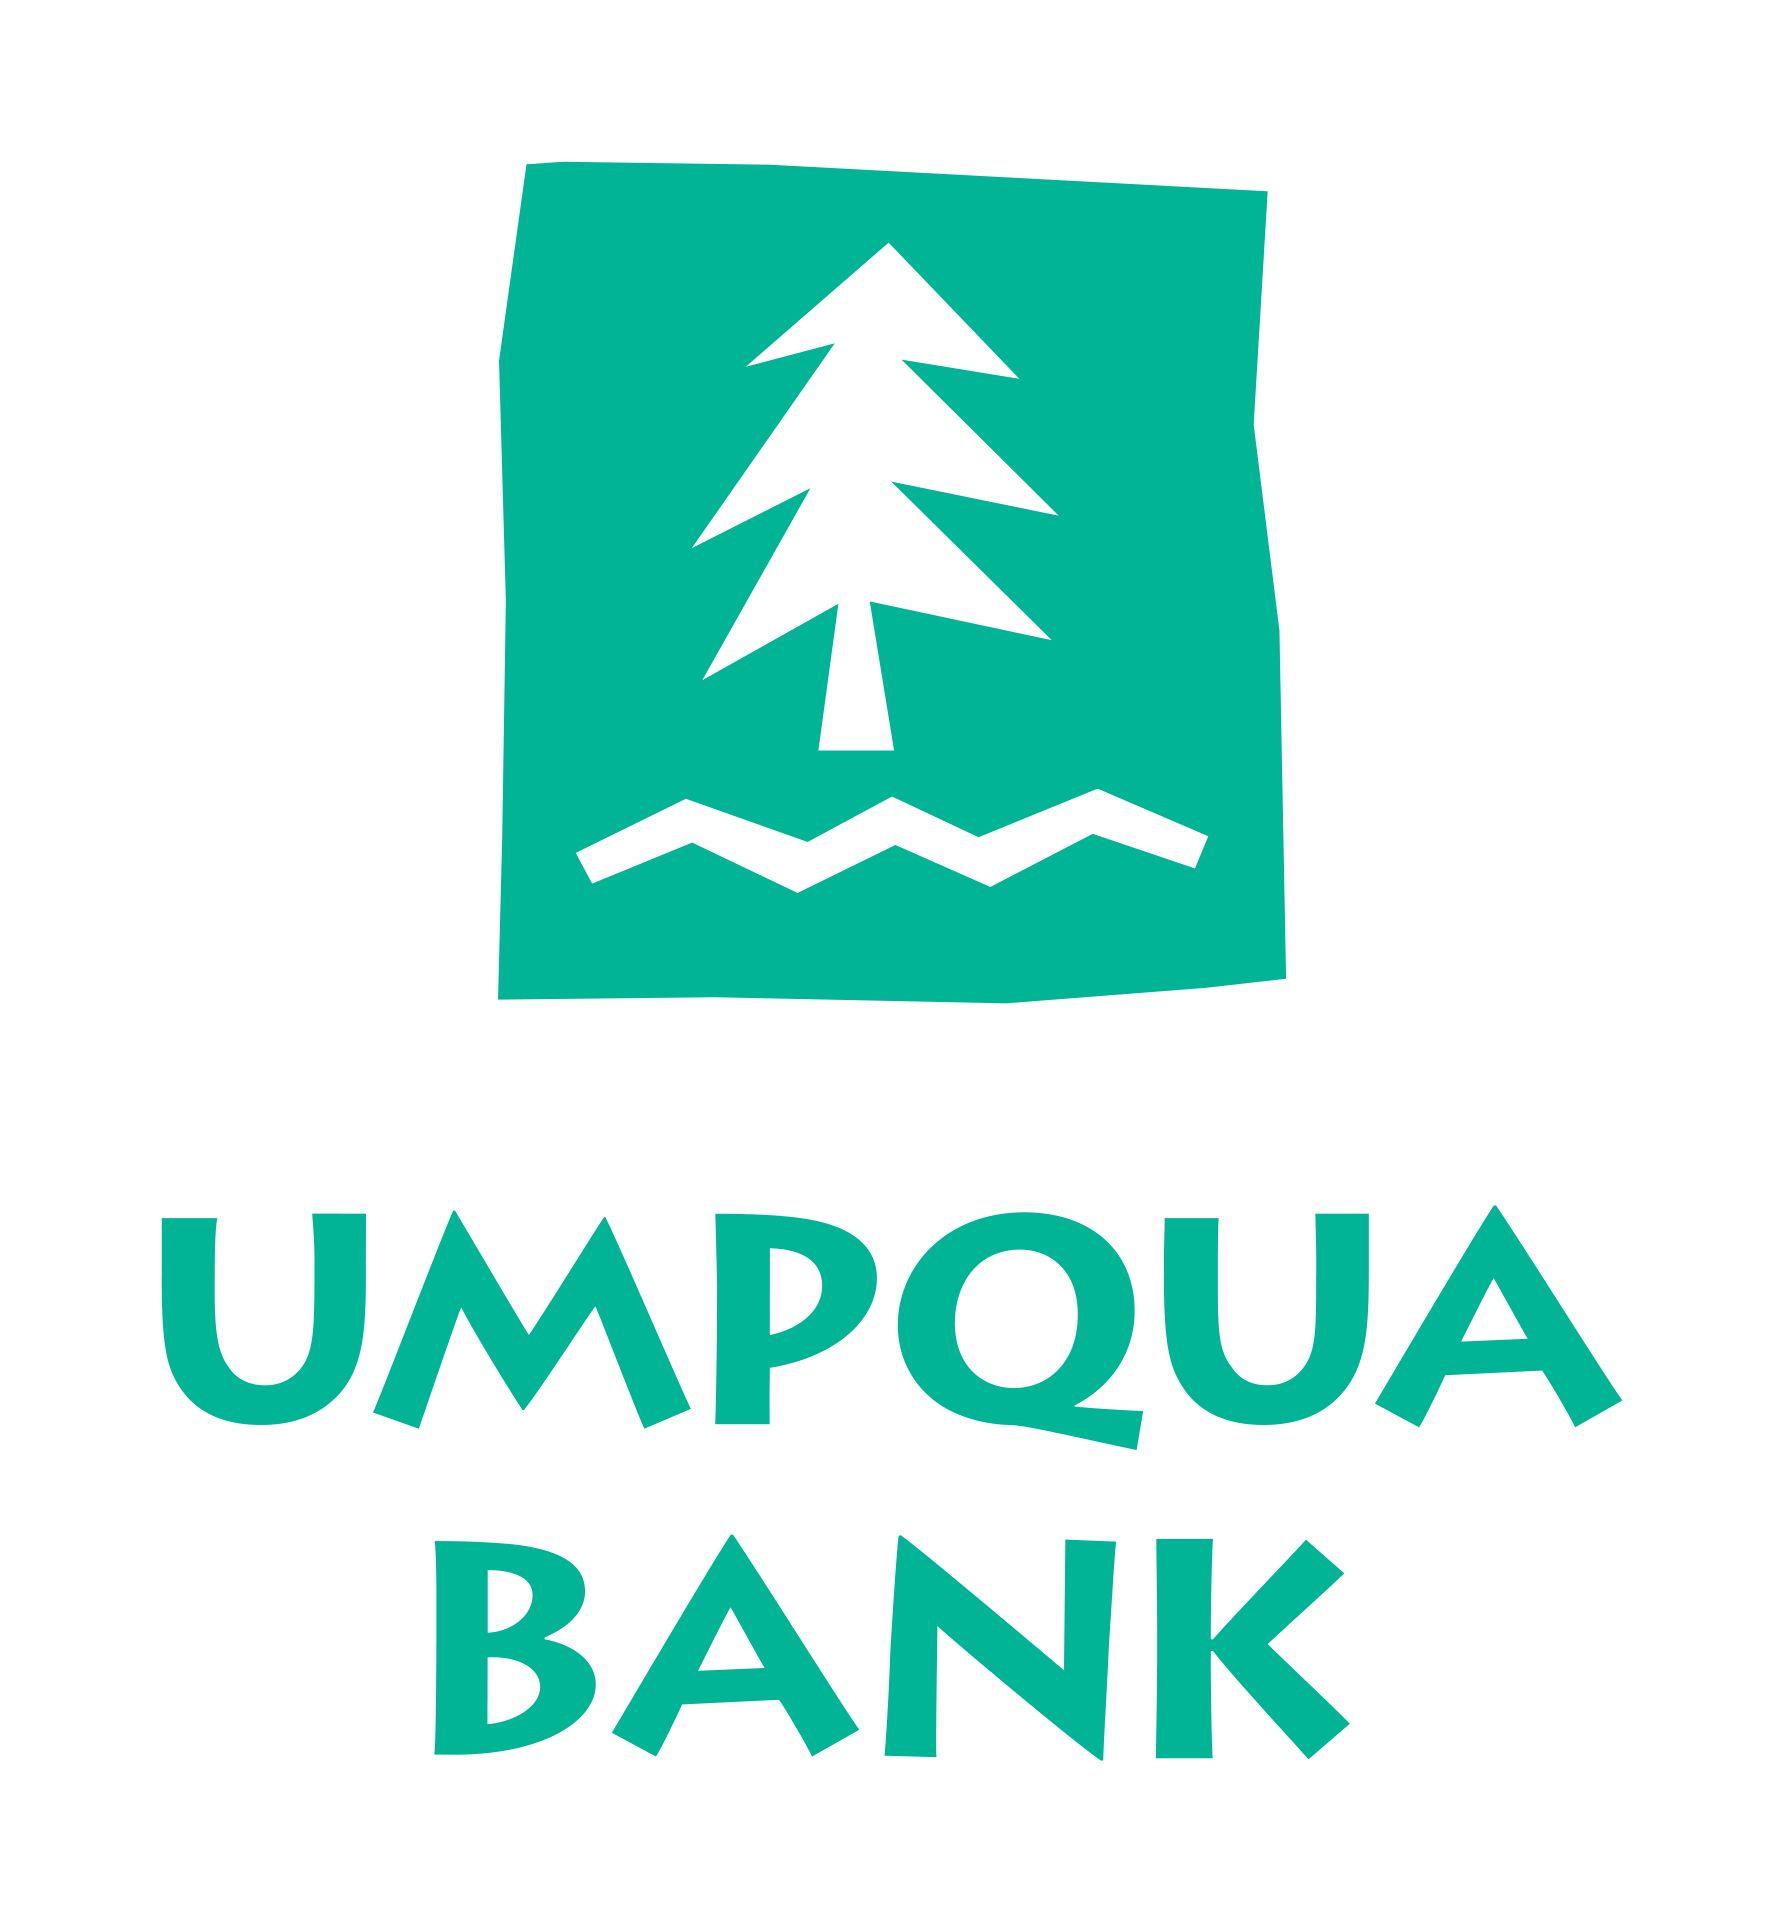 Umpqua Bank.jpg